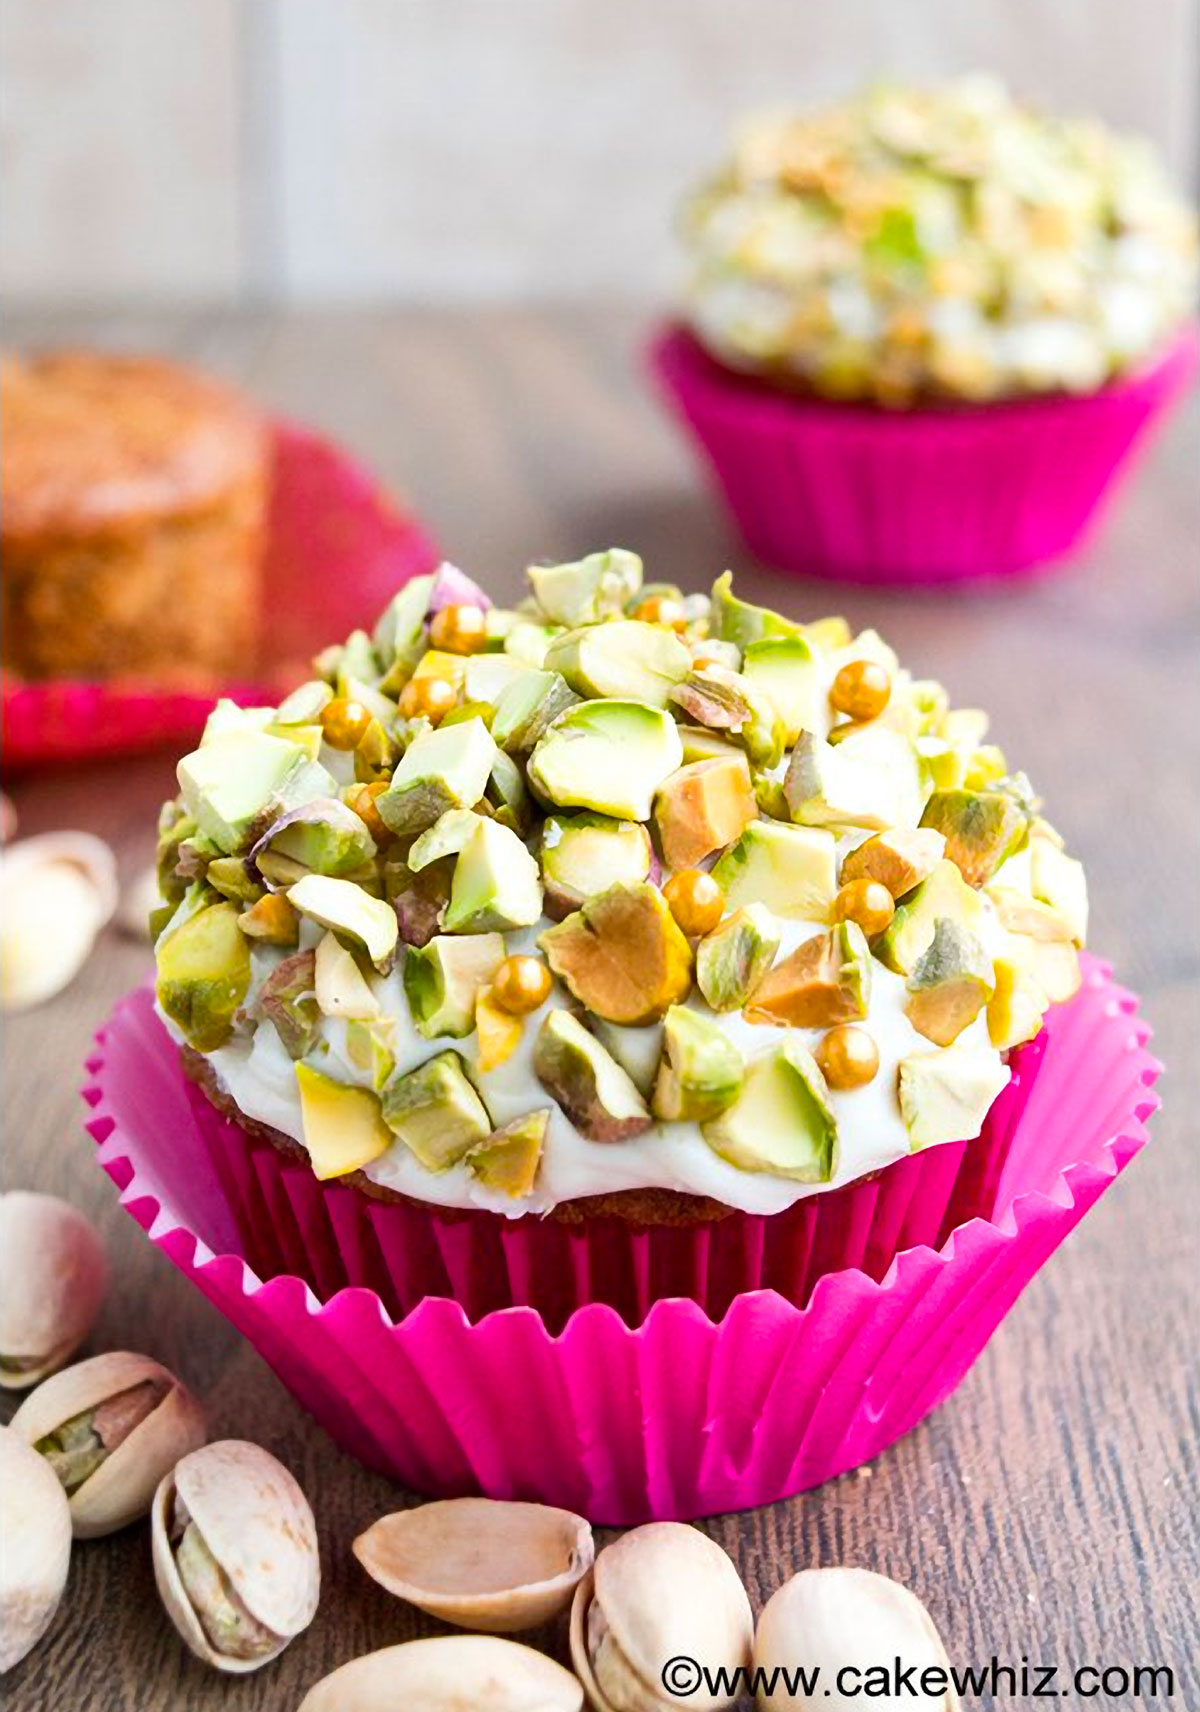 Pistachio Carrot Cupcakes